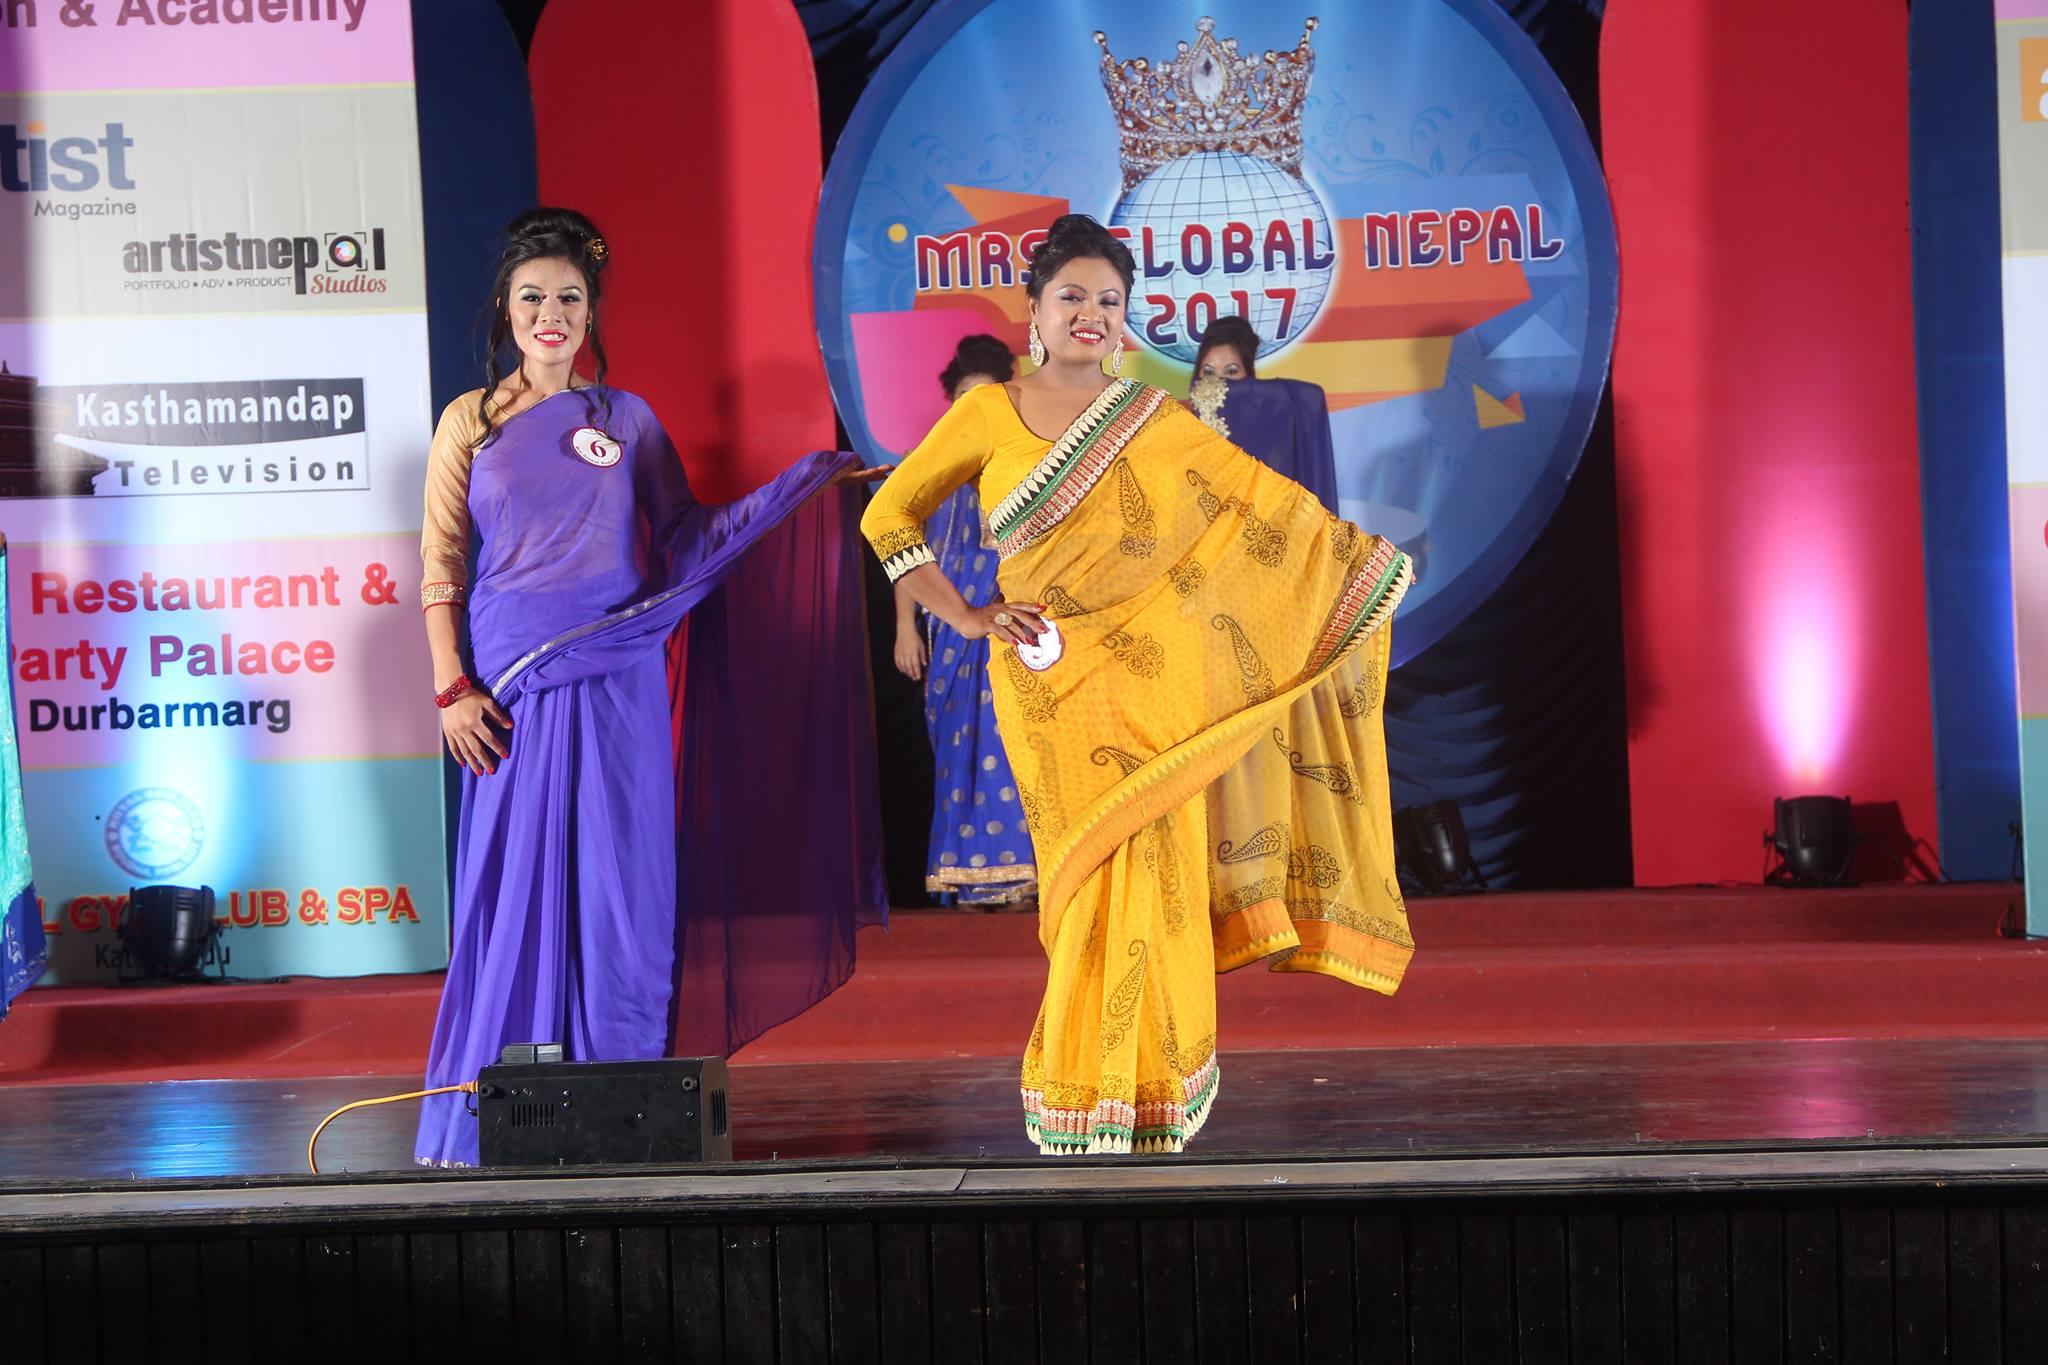 mrs global nepal 2017 final 8